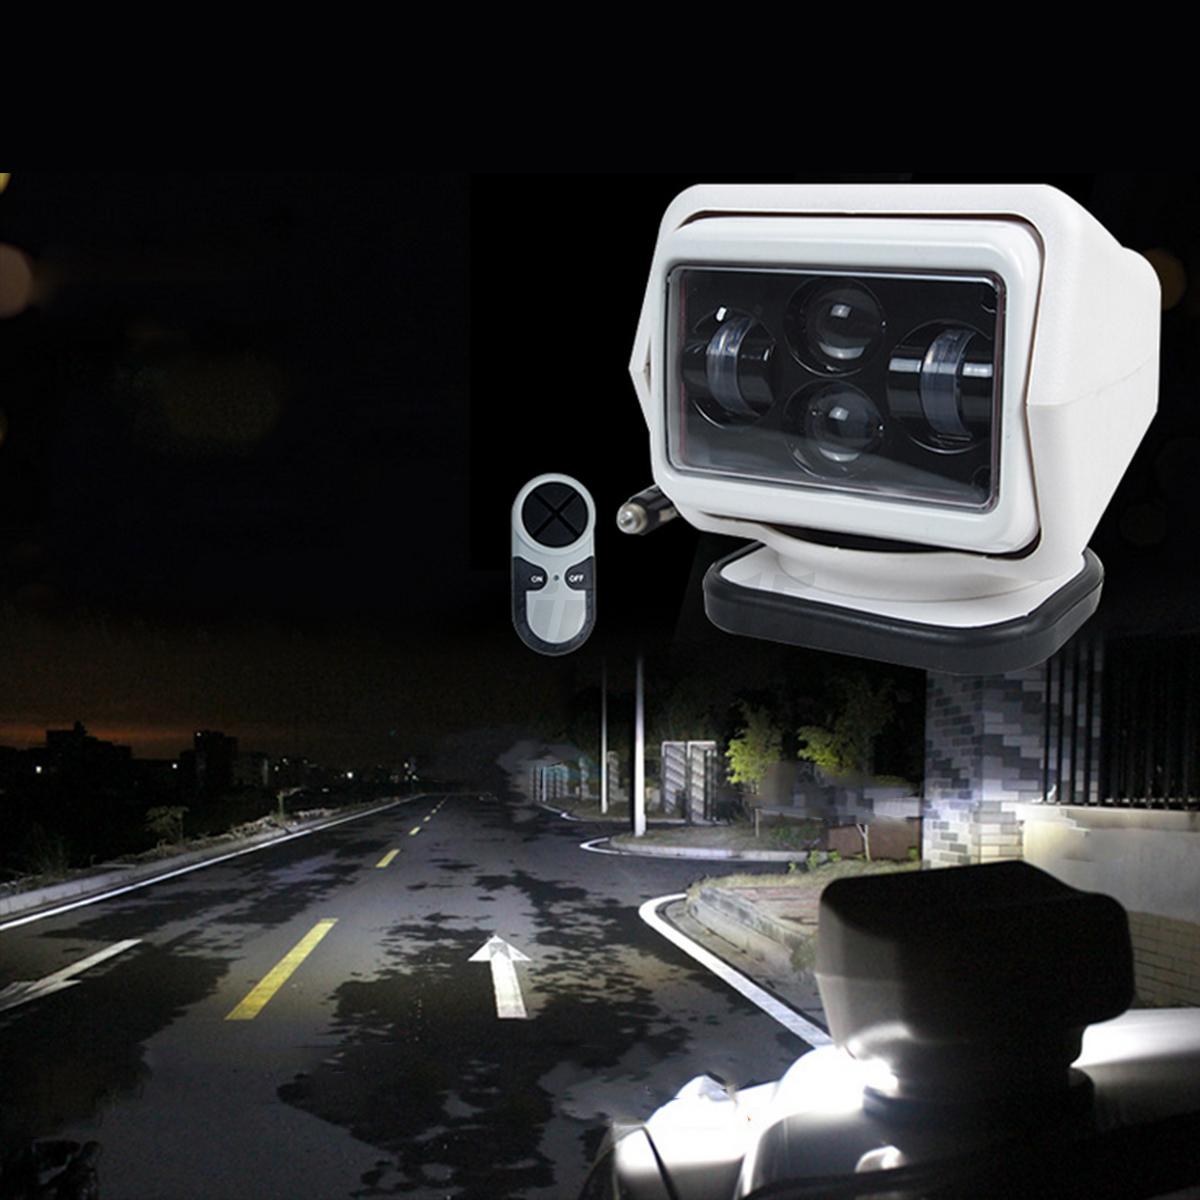 12v marin phare projecteur lumi re lampe recherche voiture bateau t l commande ebay. Black Bedroom Furniture Sets. Home Design Ideas